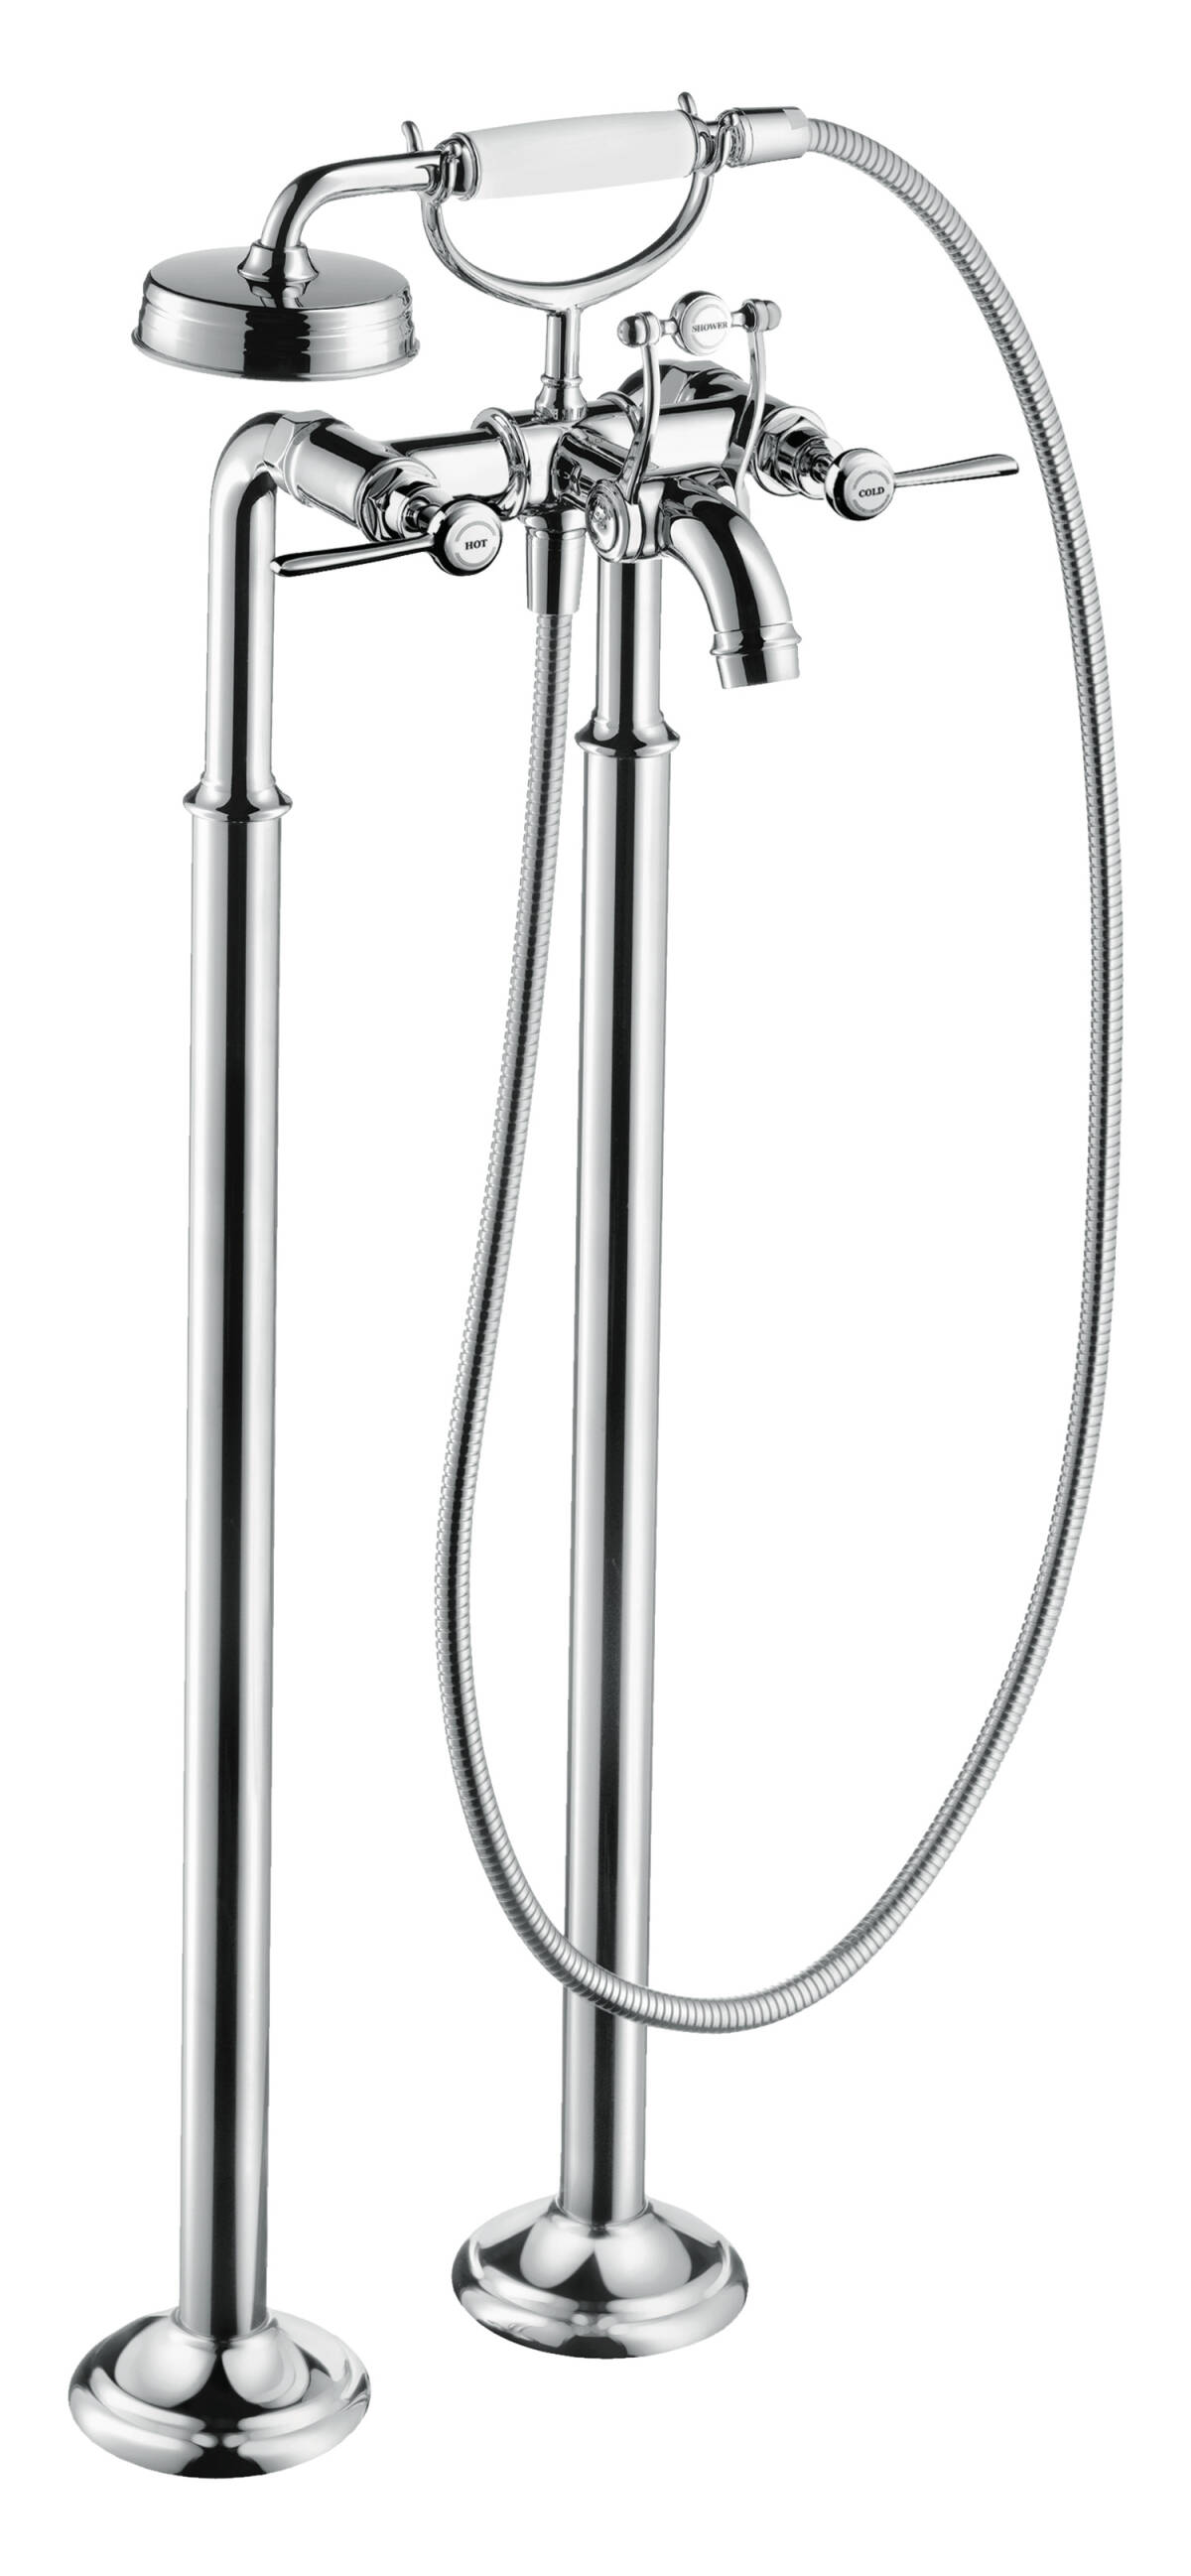 2-handle bath mixer floor-standing with lever handles, Chrome, 16553000